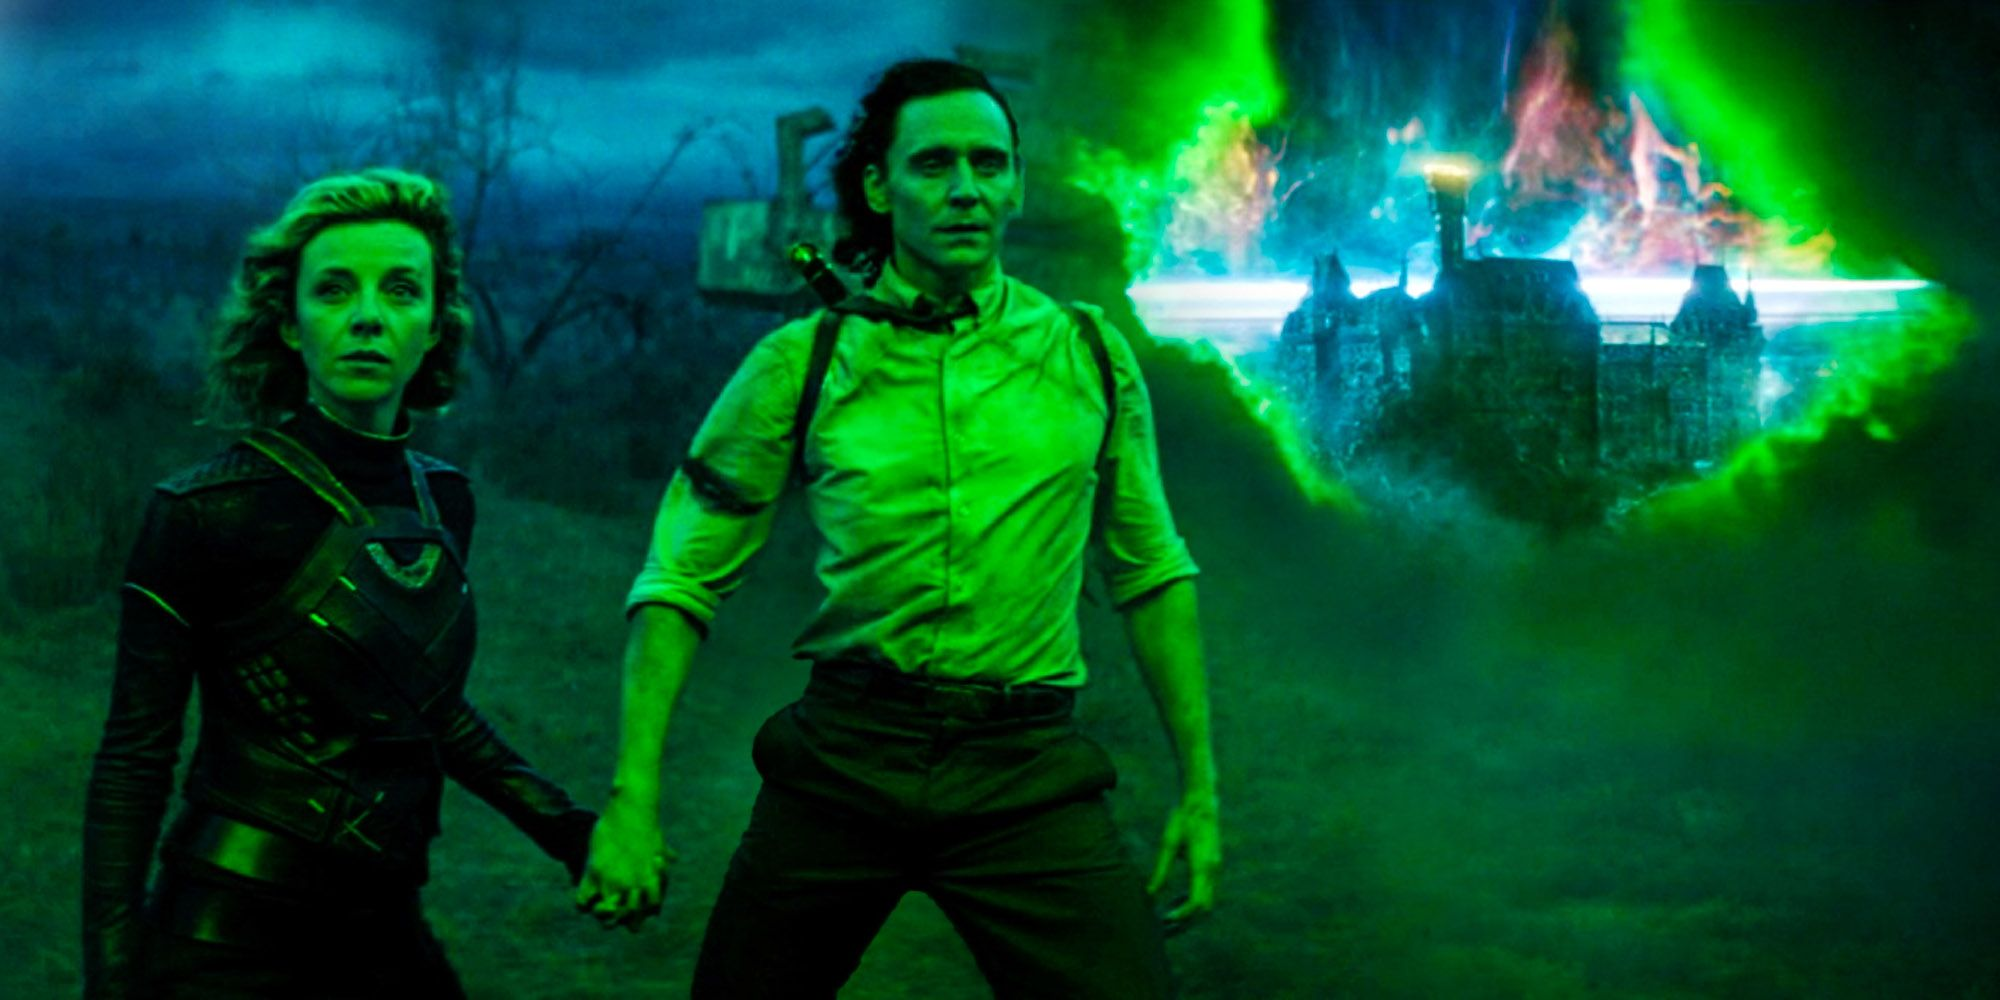 Loki Episode 5 Ending Explained: Where Are Sylvie & Loki?